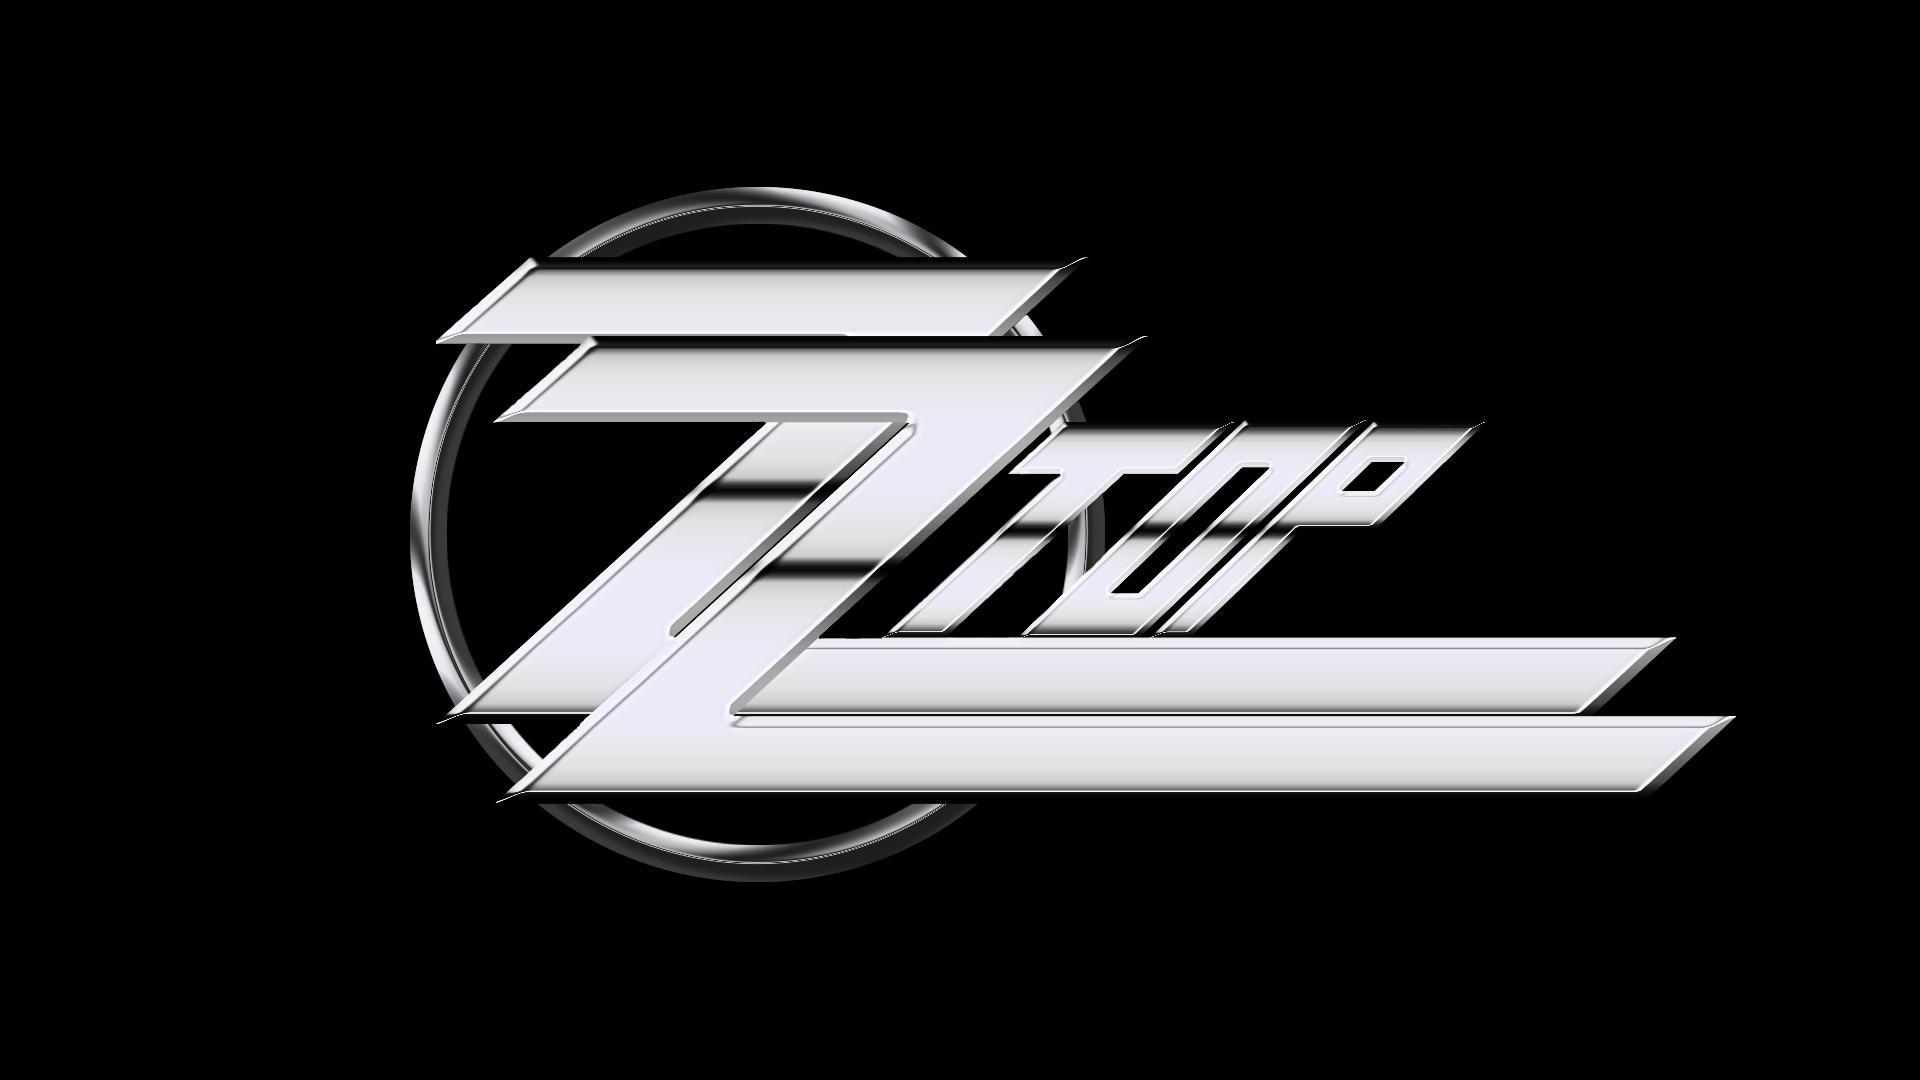 ZZ-TOP top hard rock logo wallpaper background